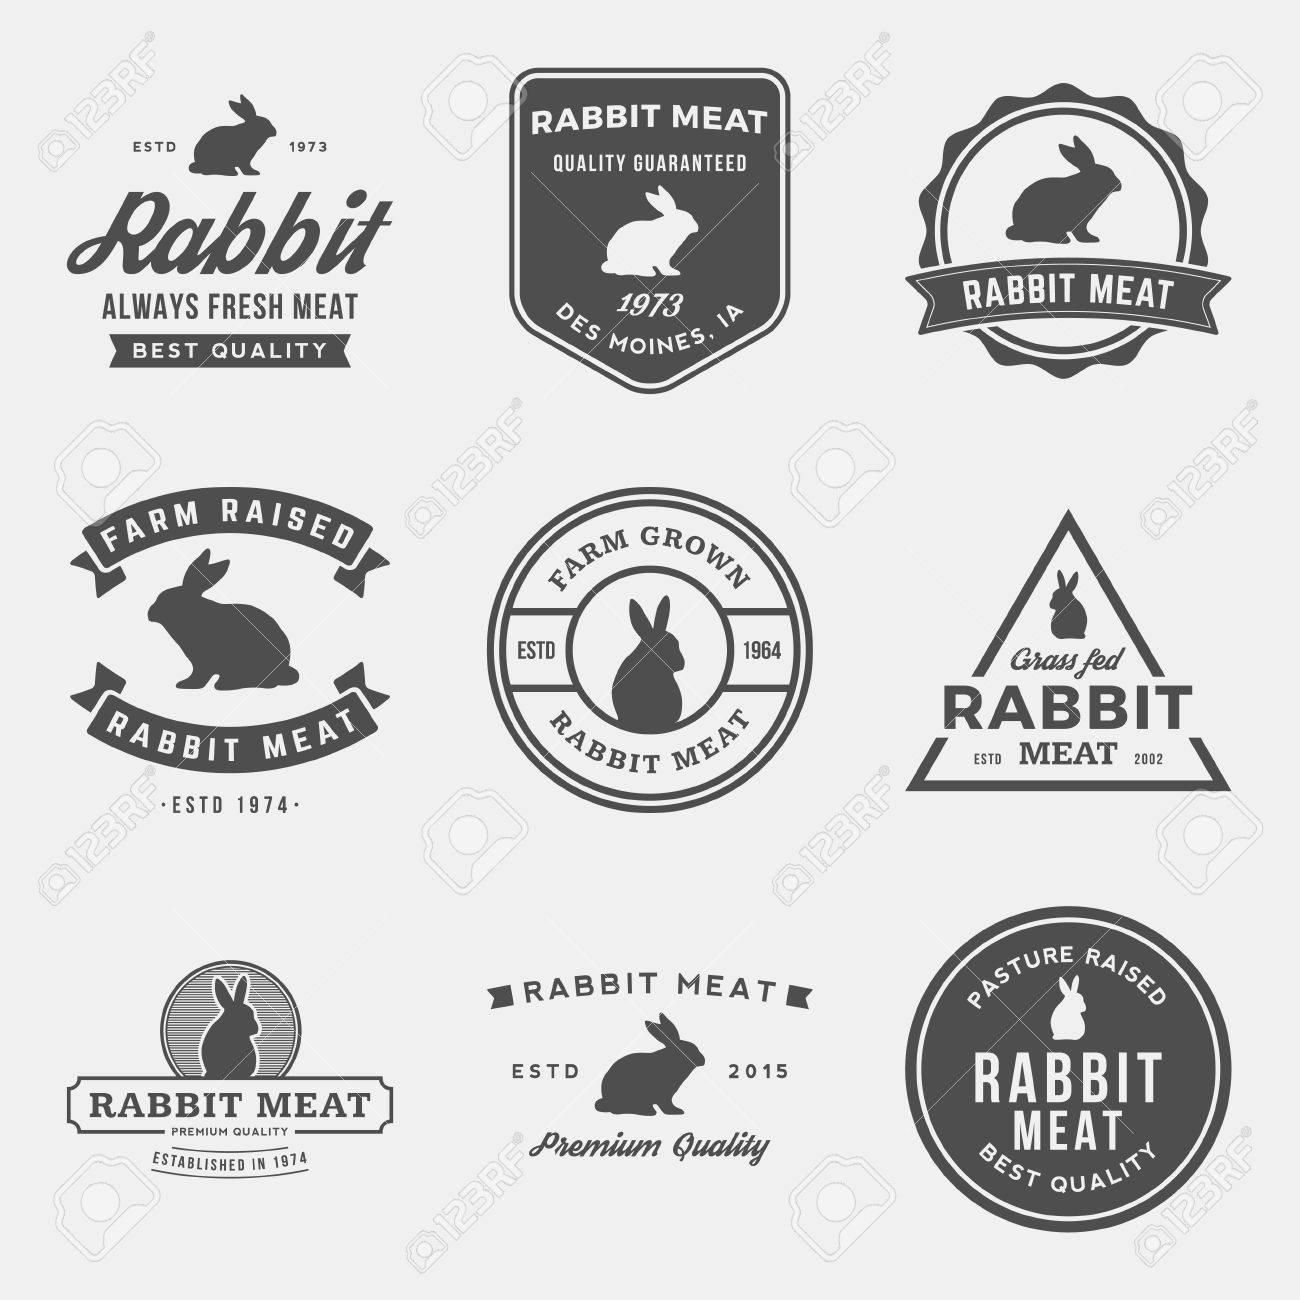 vector set of premium rabbit meat labels, badges and design elements - 42584510